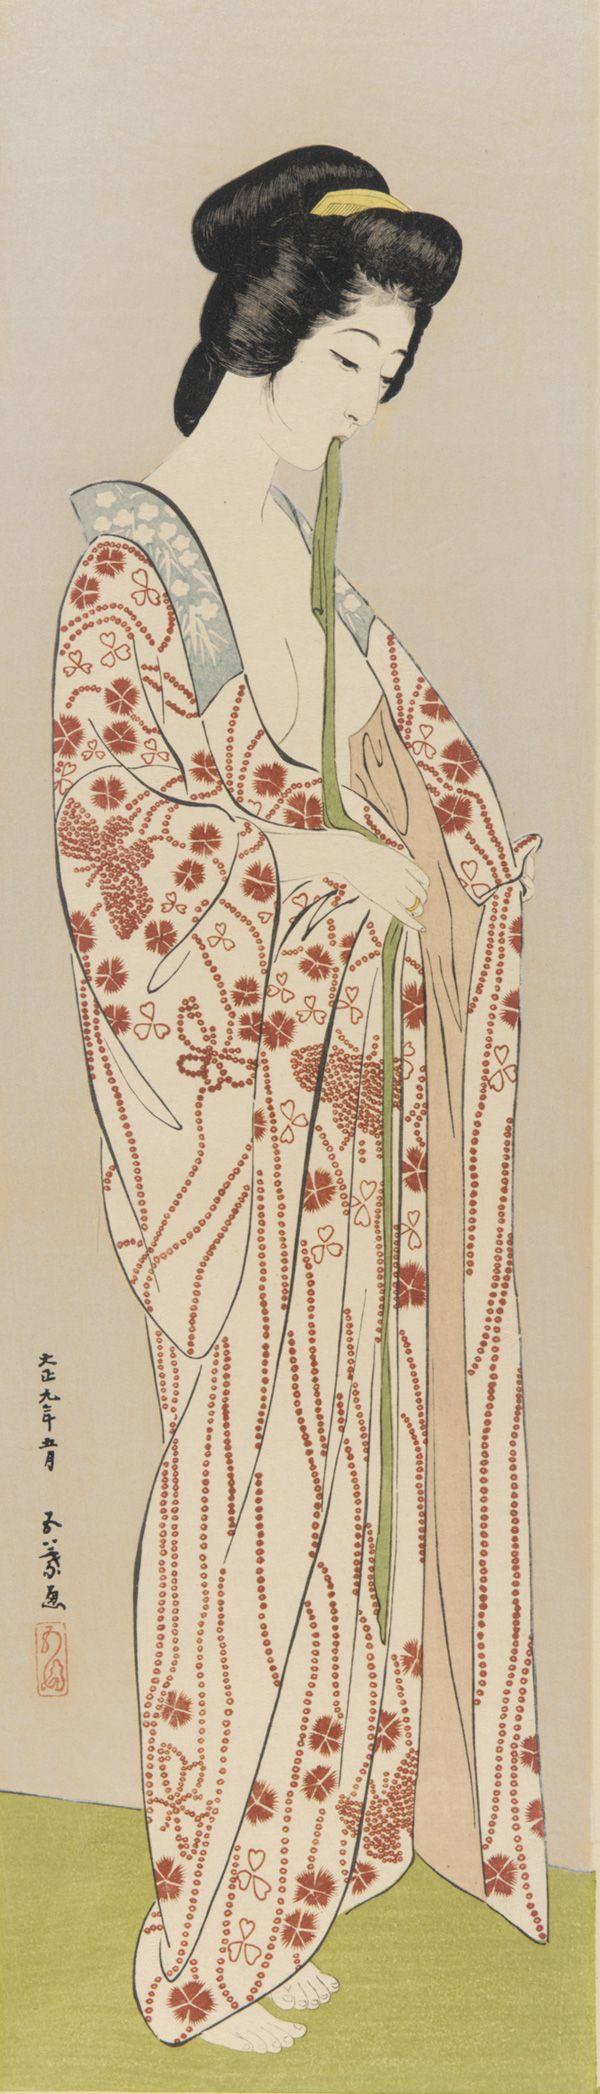 Woman putting on an undergarment  By Hashiguchi Goyo , (Japanese, 1880-1921)  Taisho era